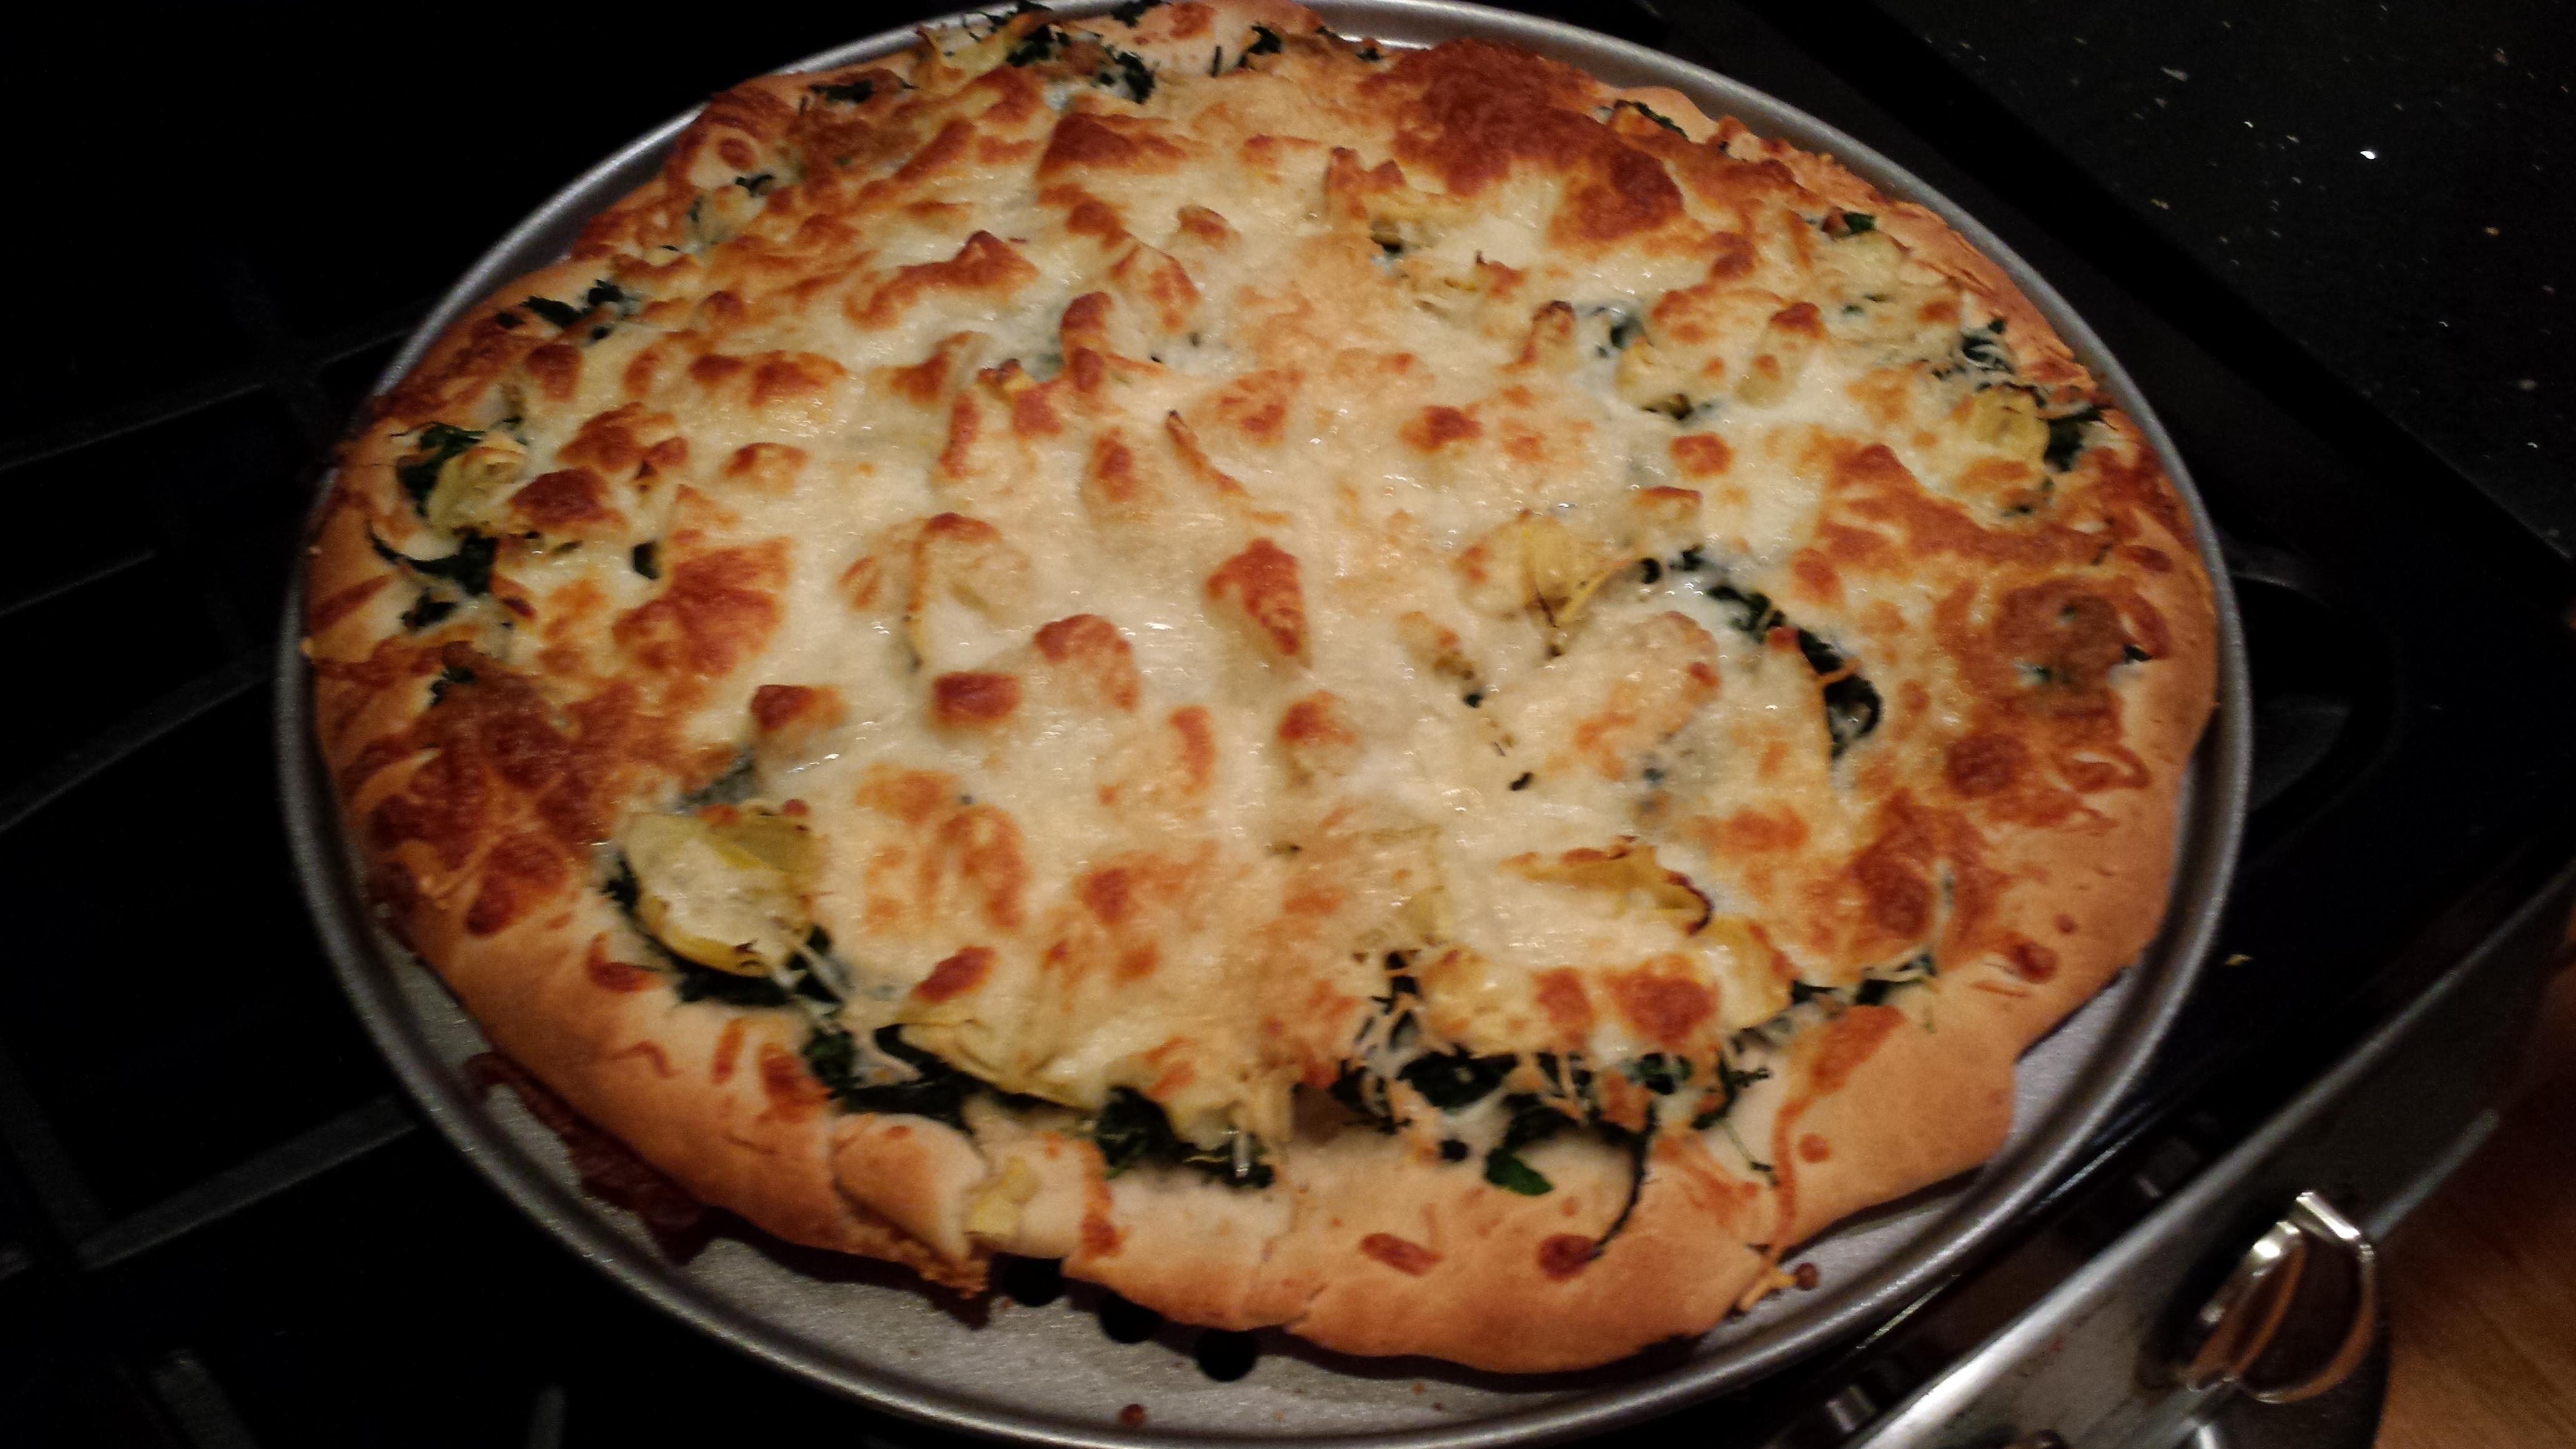 Pizza by commentariat member Celeste: Spinach, artichokes, mozarella, parmesan, forgot the garlic